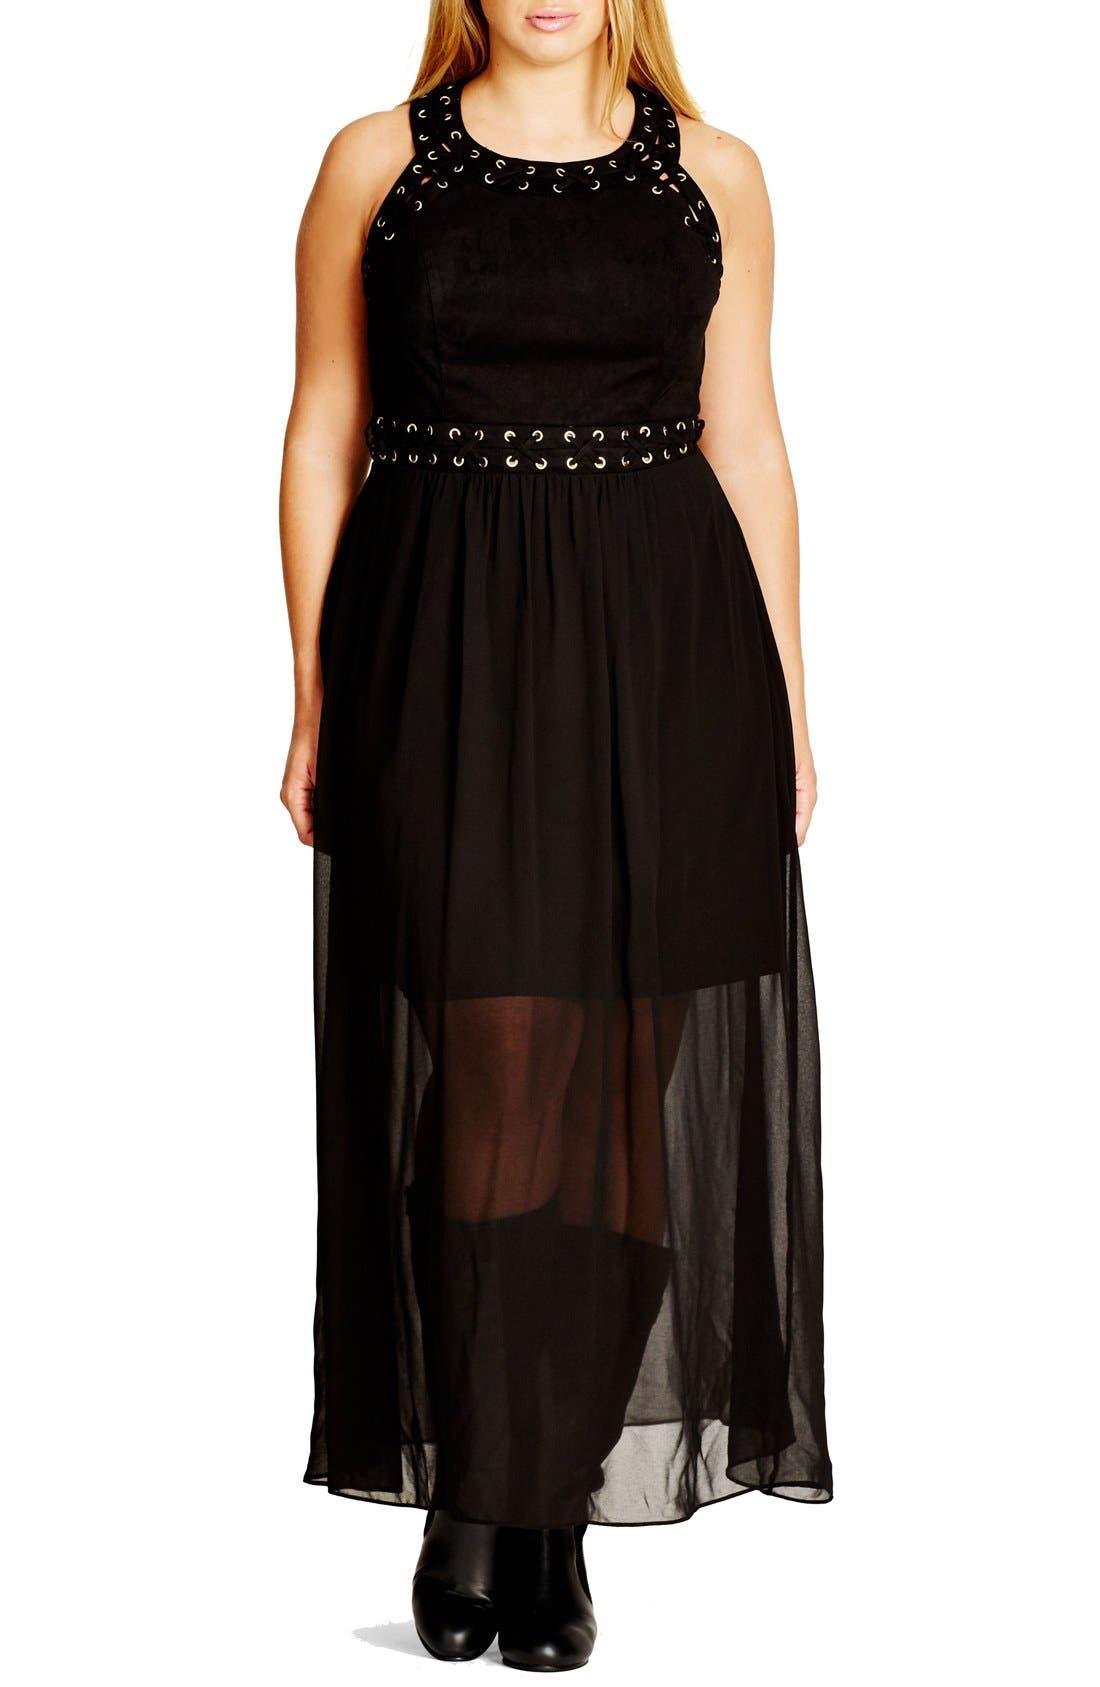 'Rhianna' Lace-Up Trim Faux Suede & Chiffon Maxi Dress,                             Main thumbnail 1, color,                             001